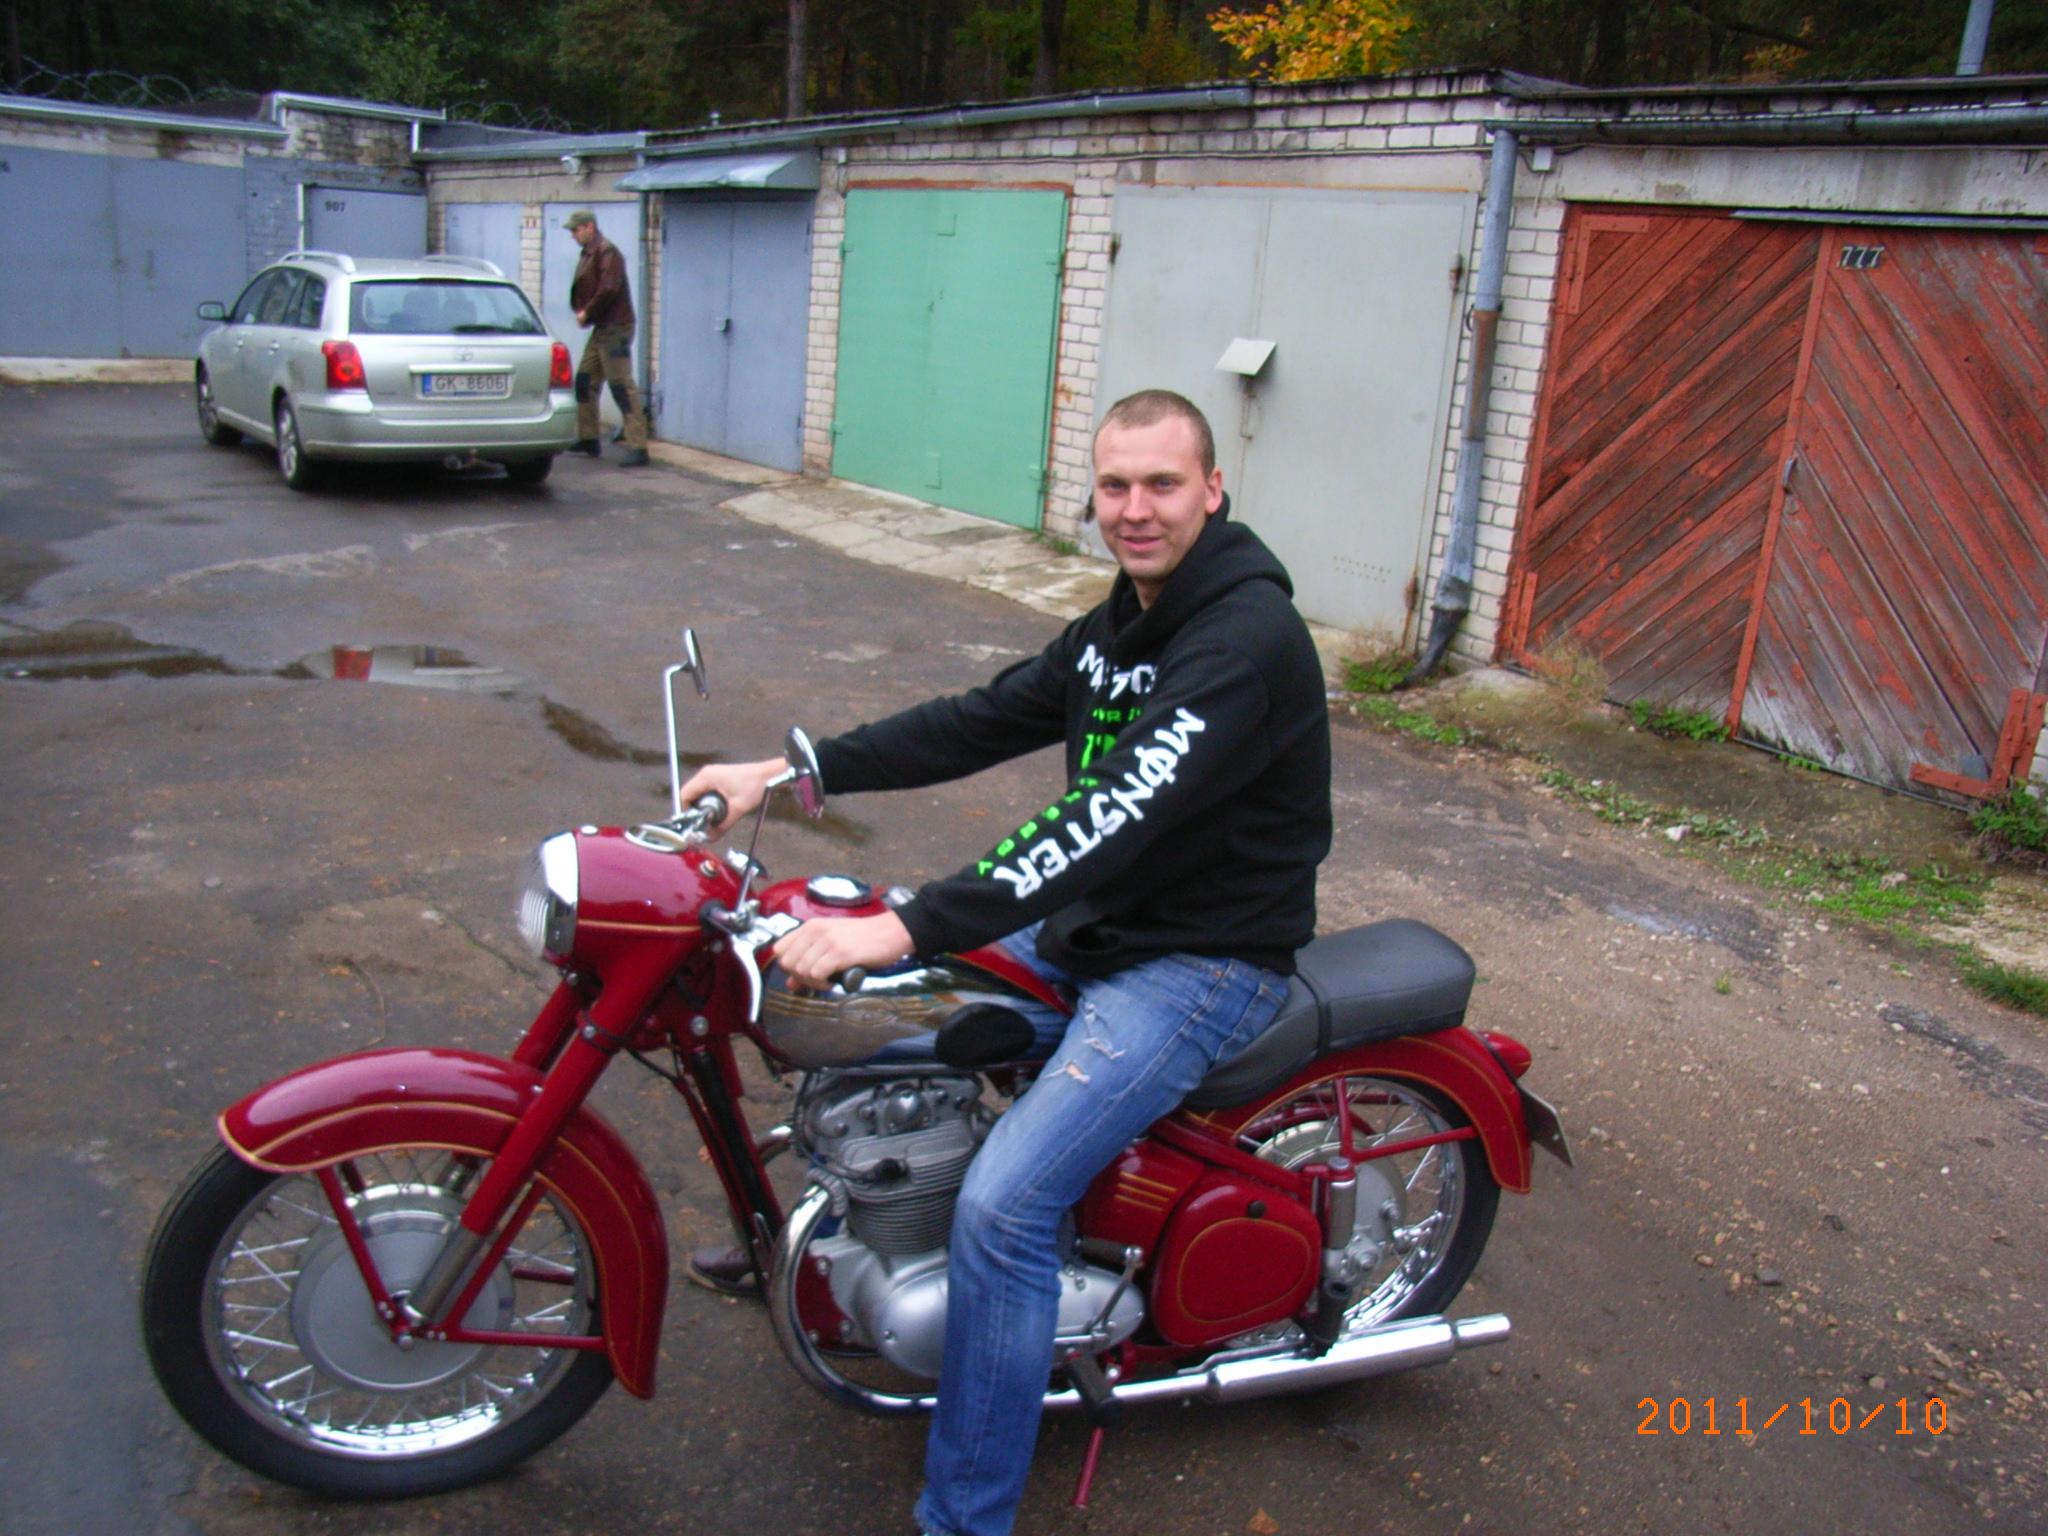 www.bildites.lv/images/9r102a9zba5bbyyw30d7.jpg